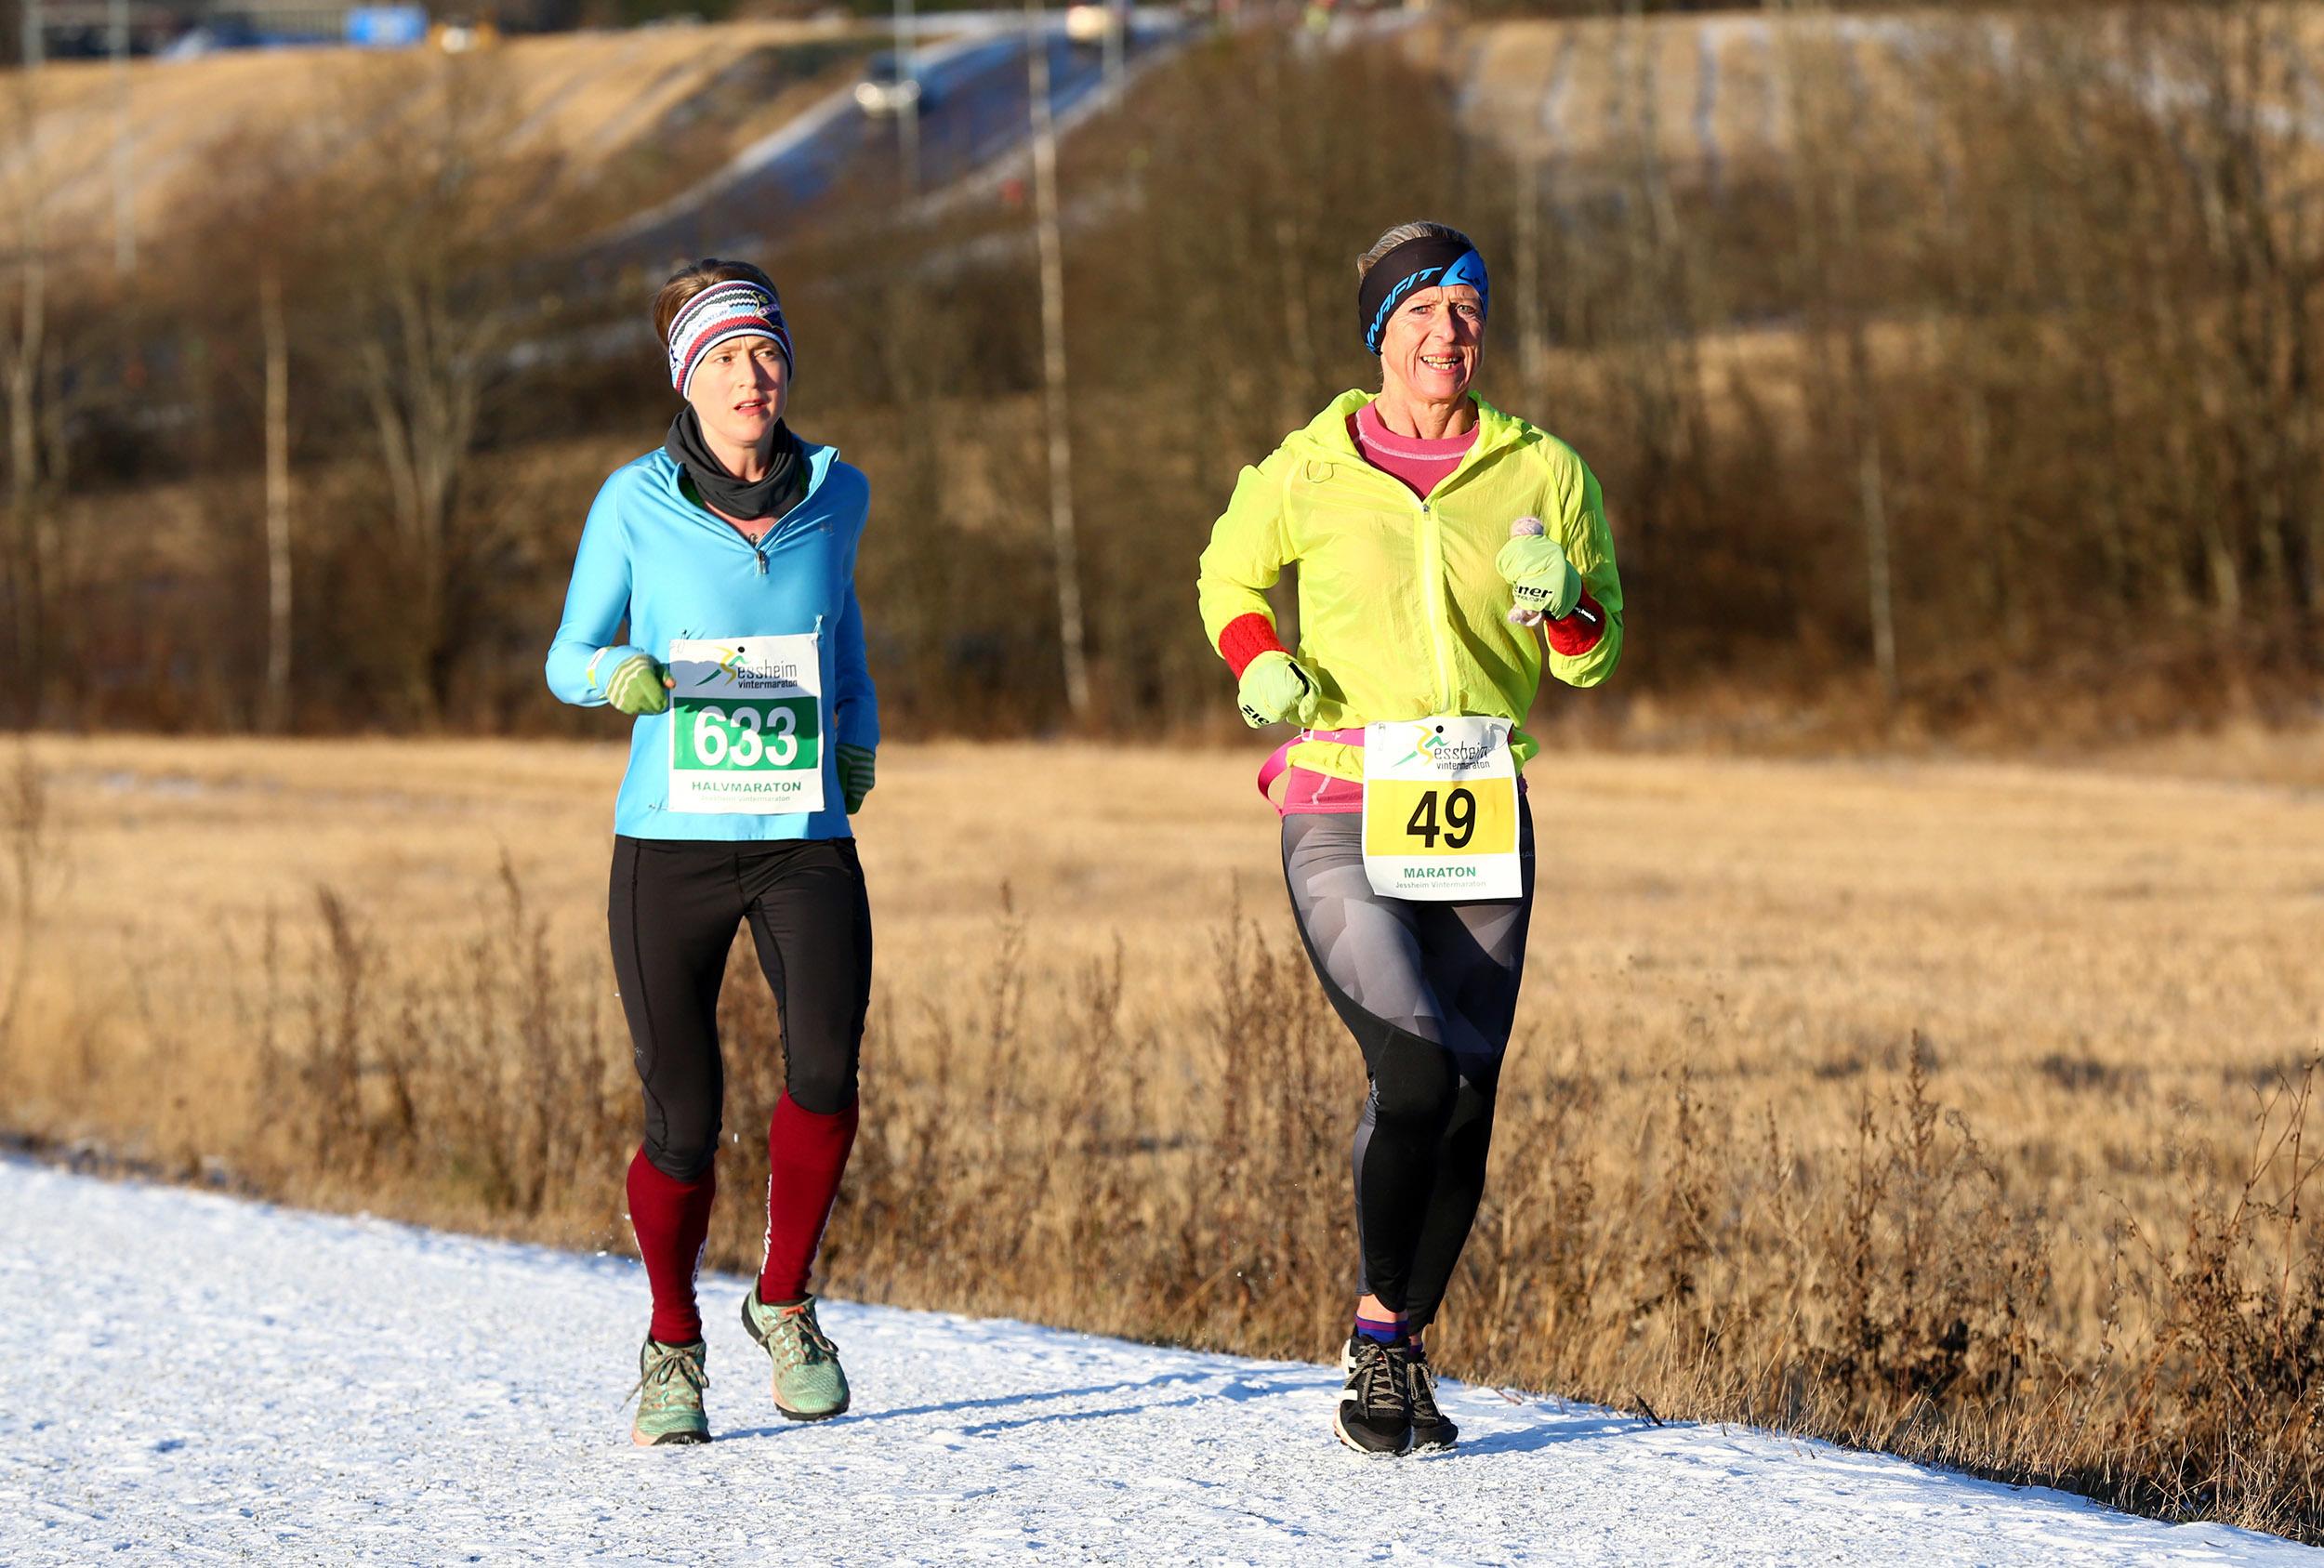 Vintermaraton1227_Ley_Muller.jpg